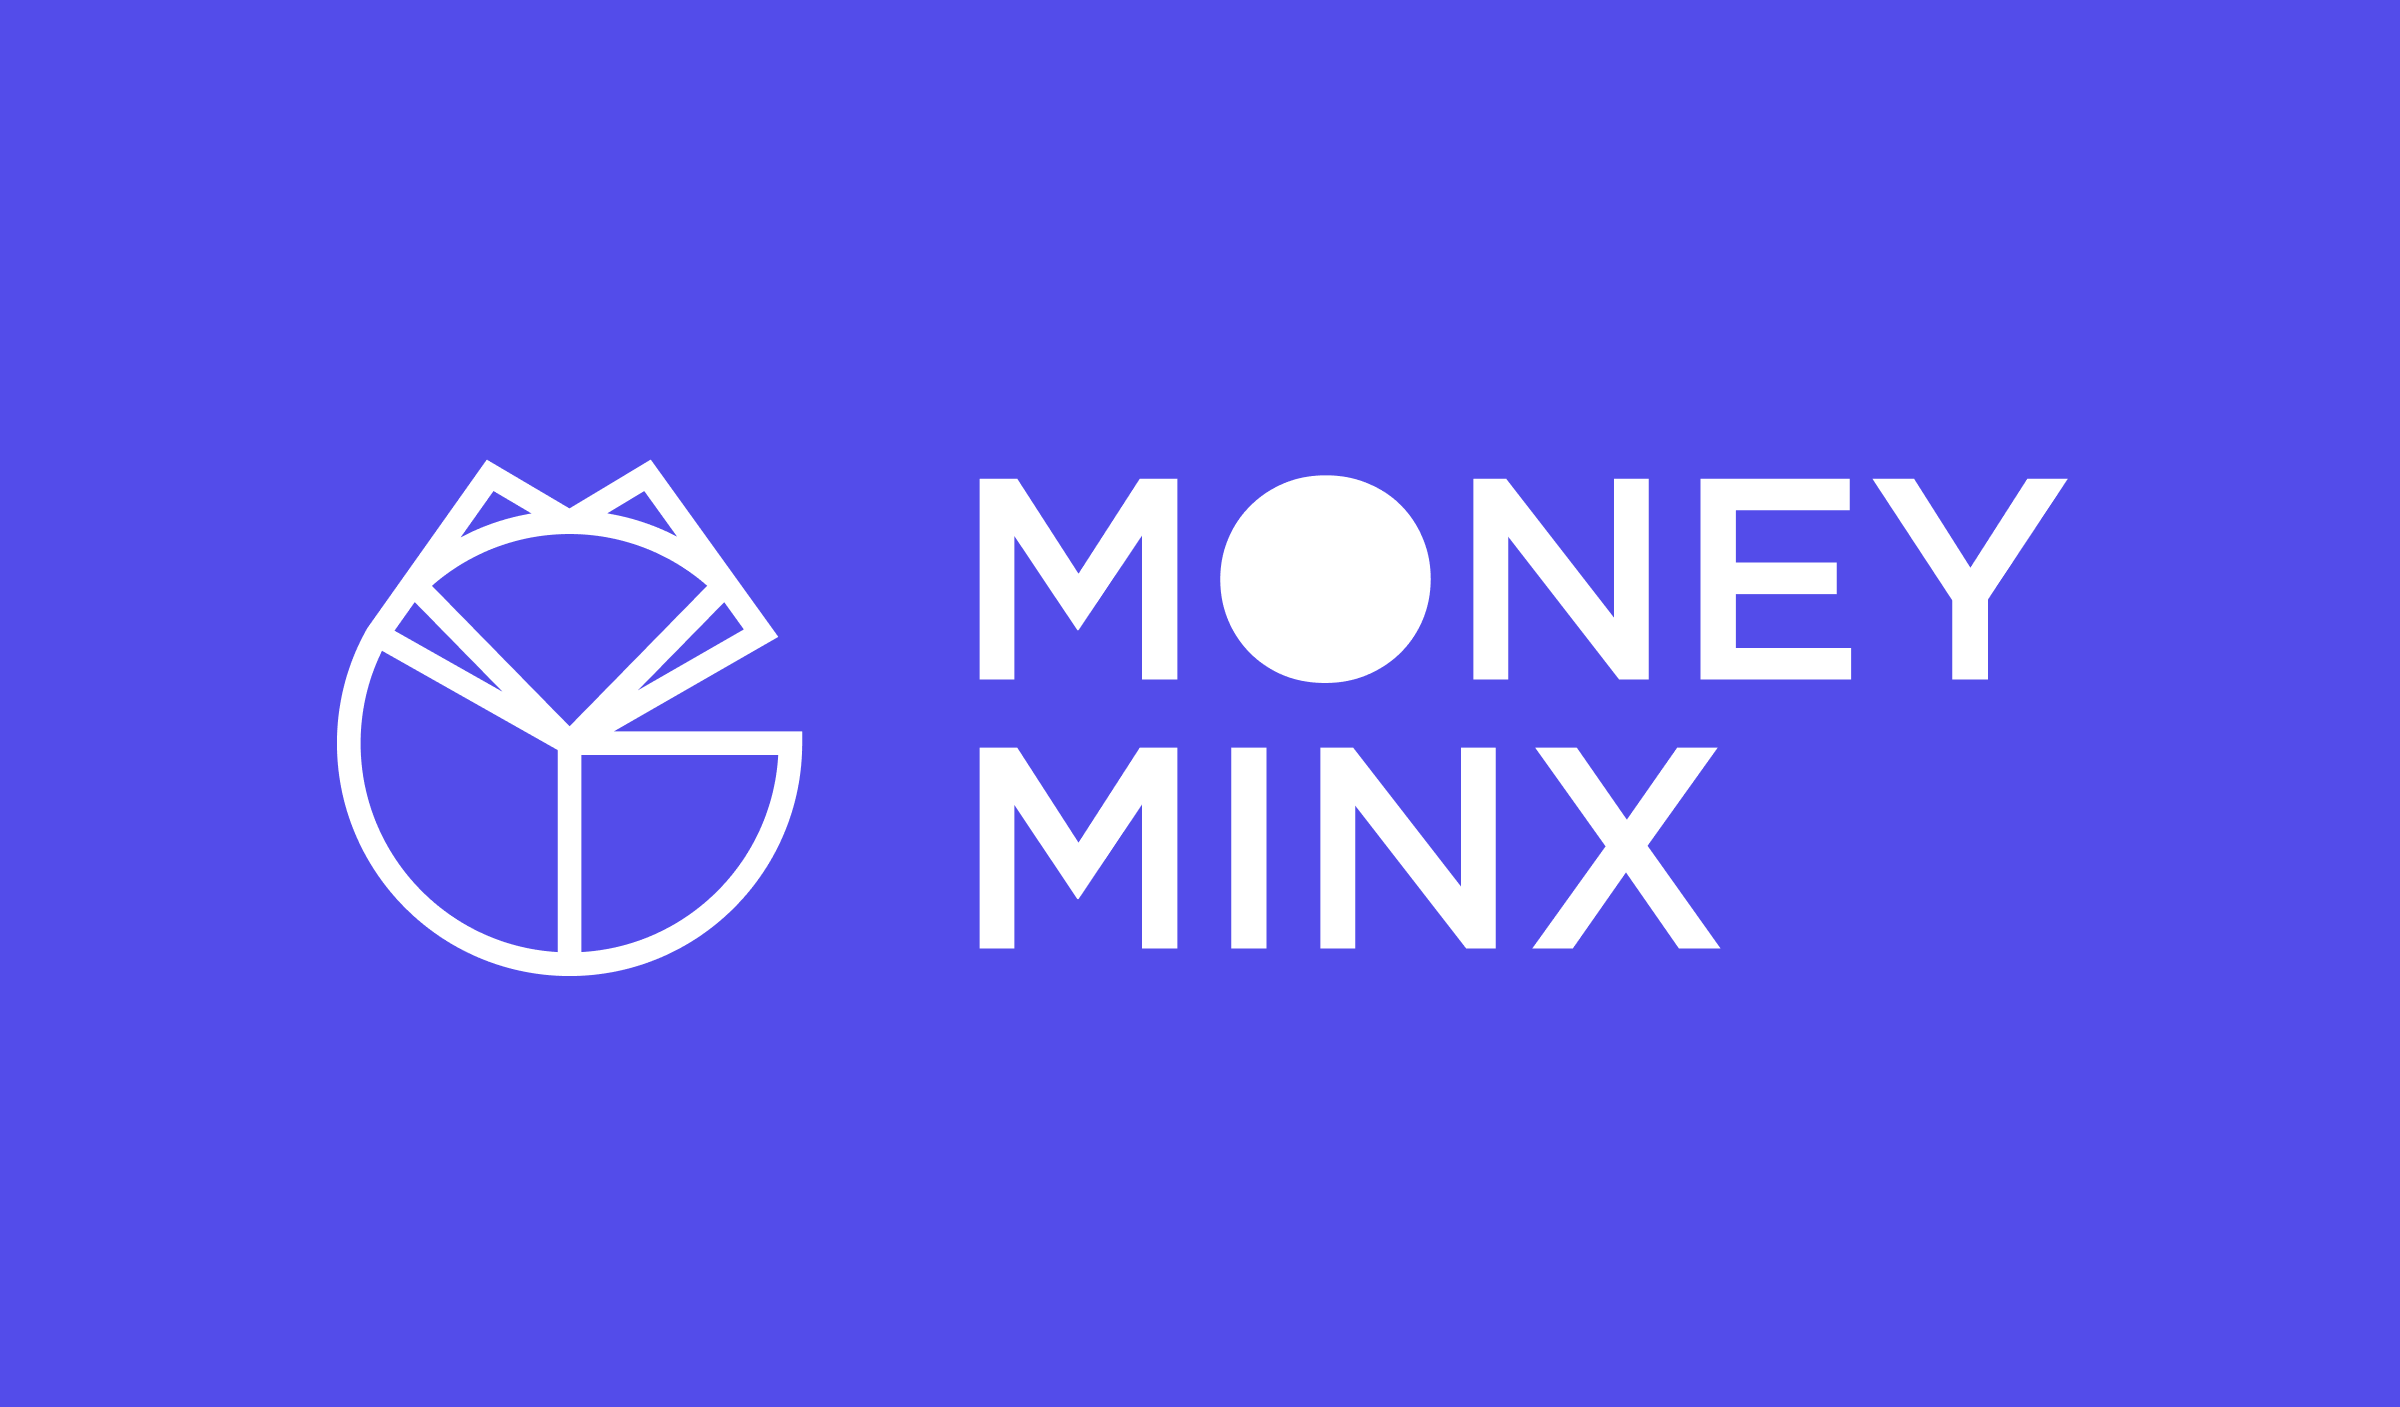 MoneyMinx logo